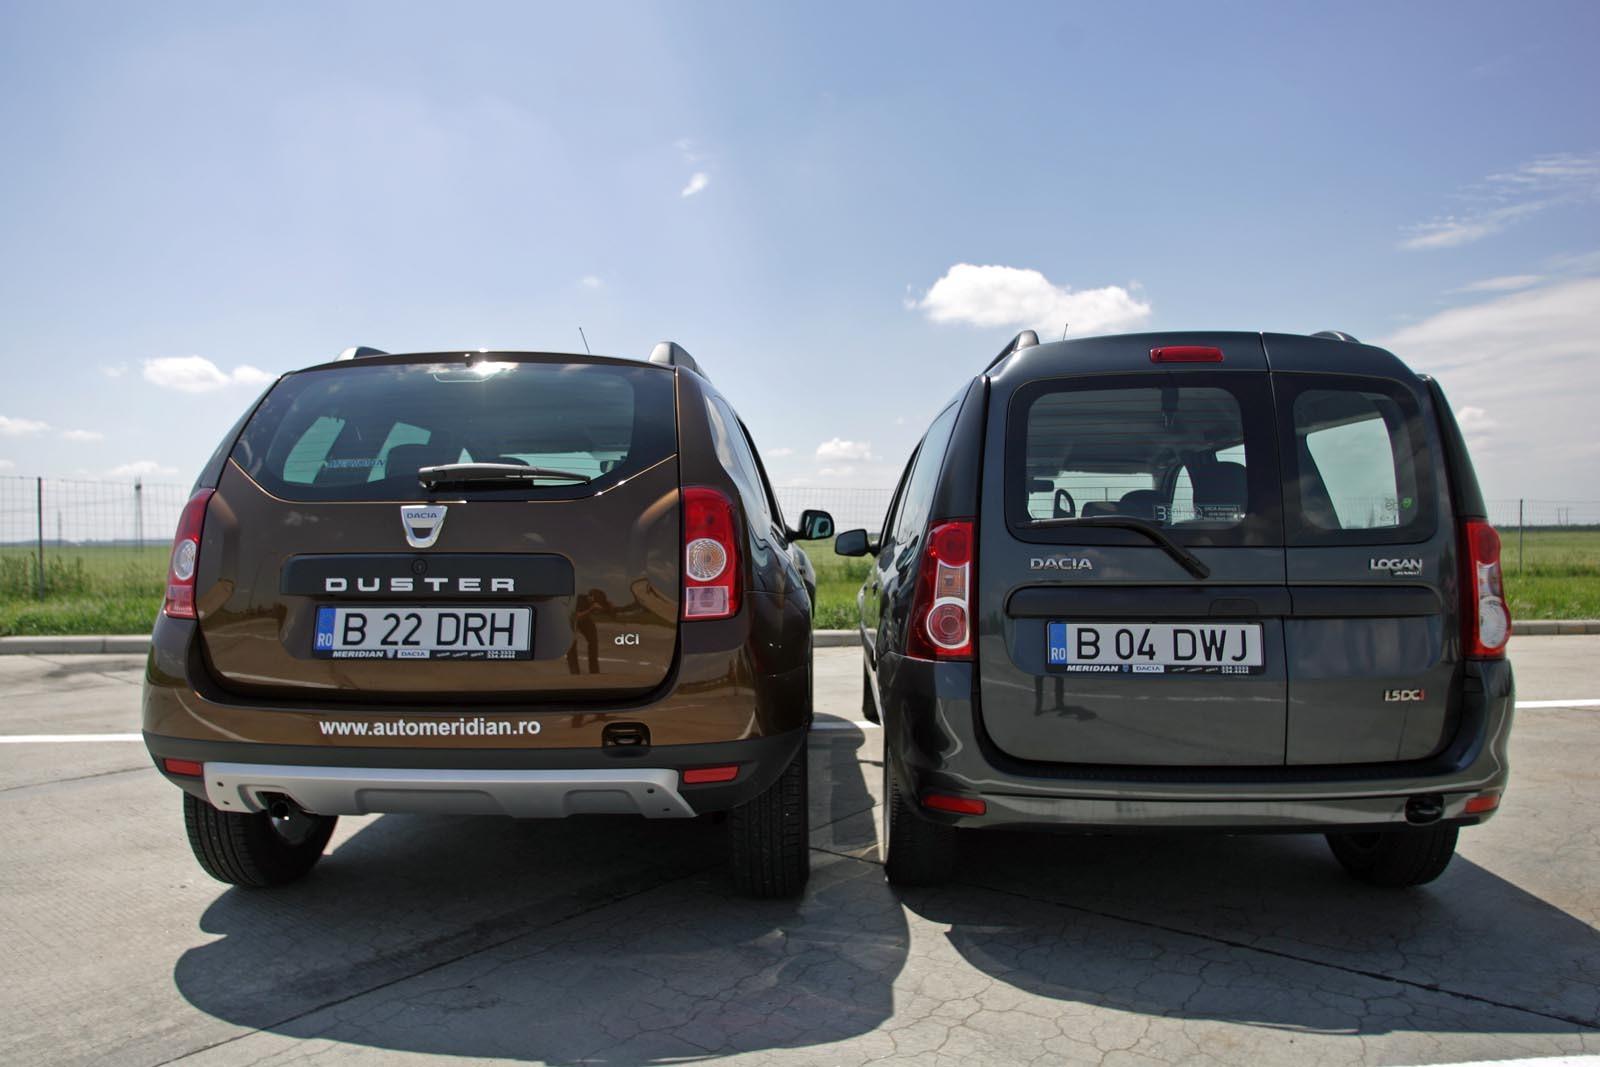 Dacia Logan Duster. RE: Duster vs .